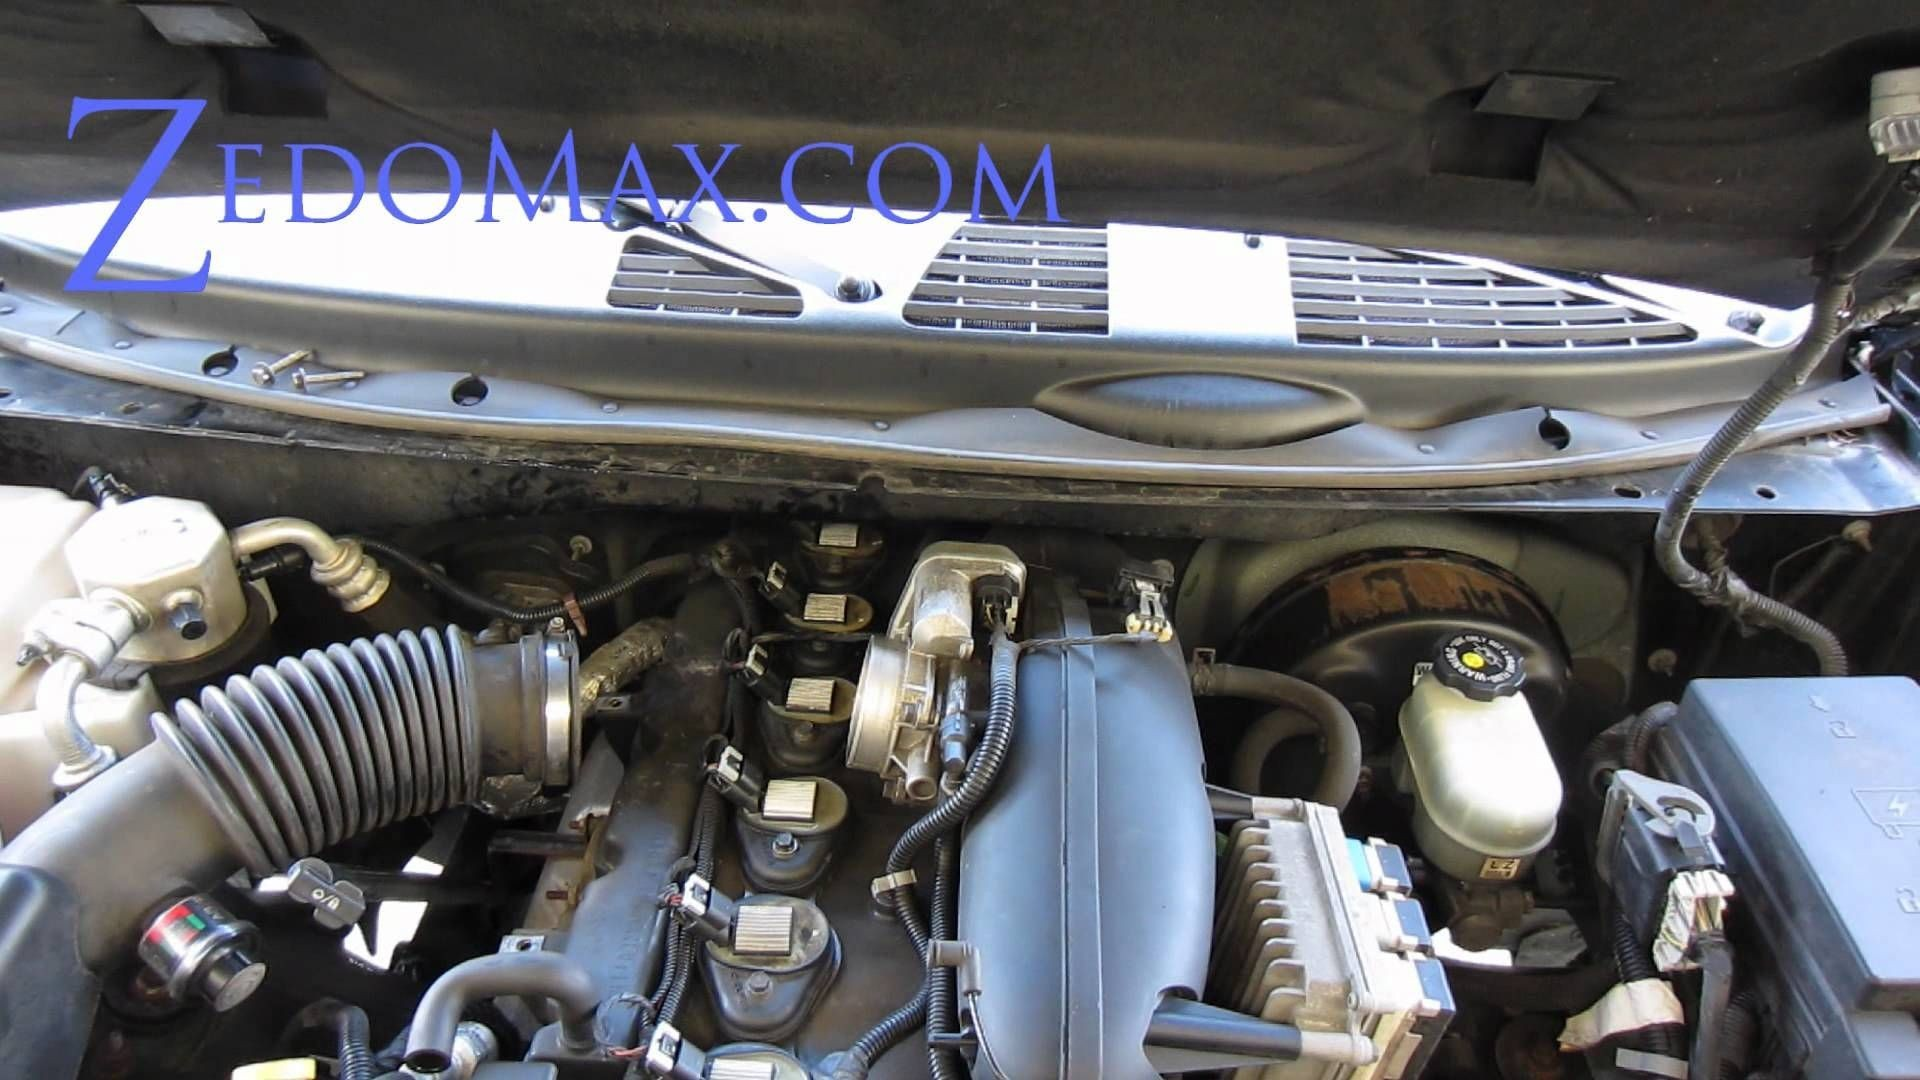 hight resolution of 2002 trailblazer engine diagram 2003 chevy trailblazer engine diagram how to replace ignition coil of 2002